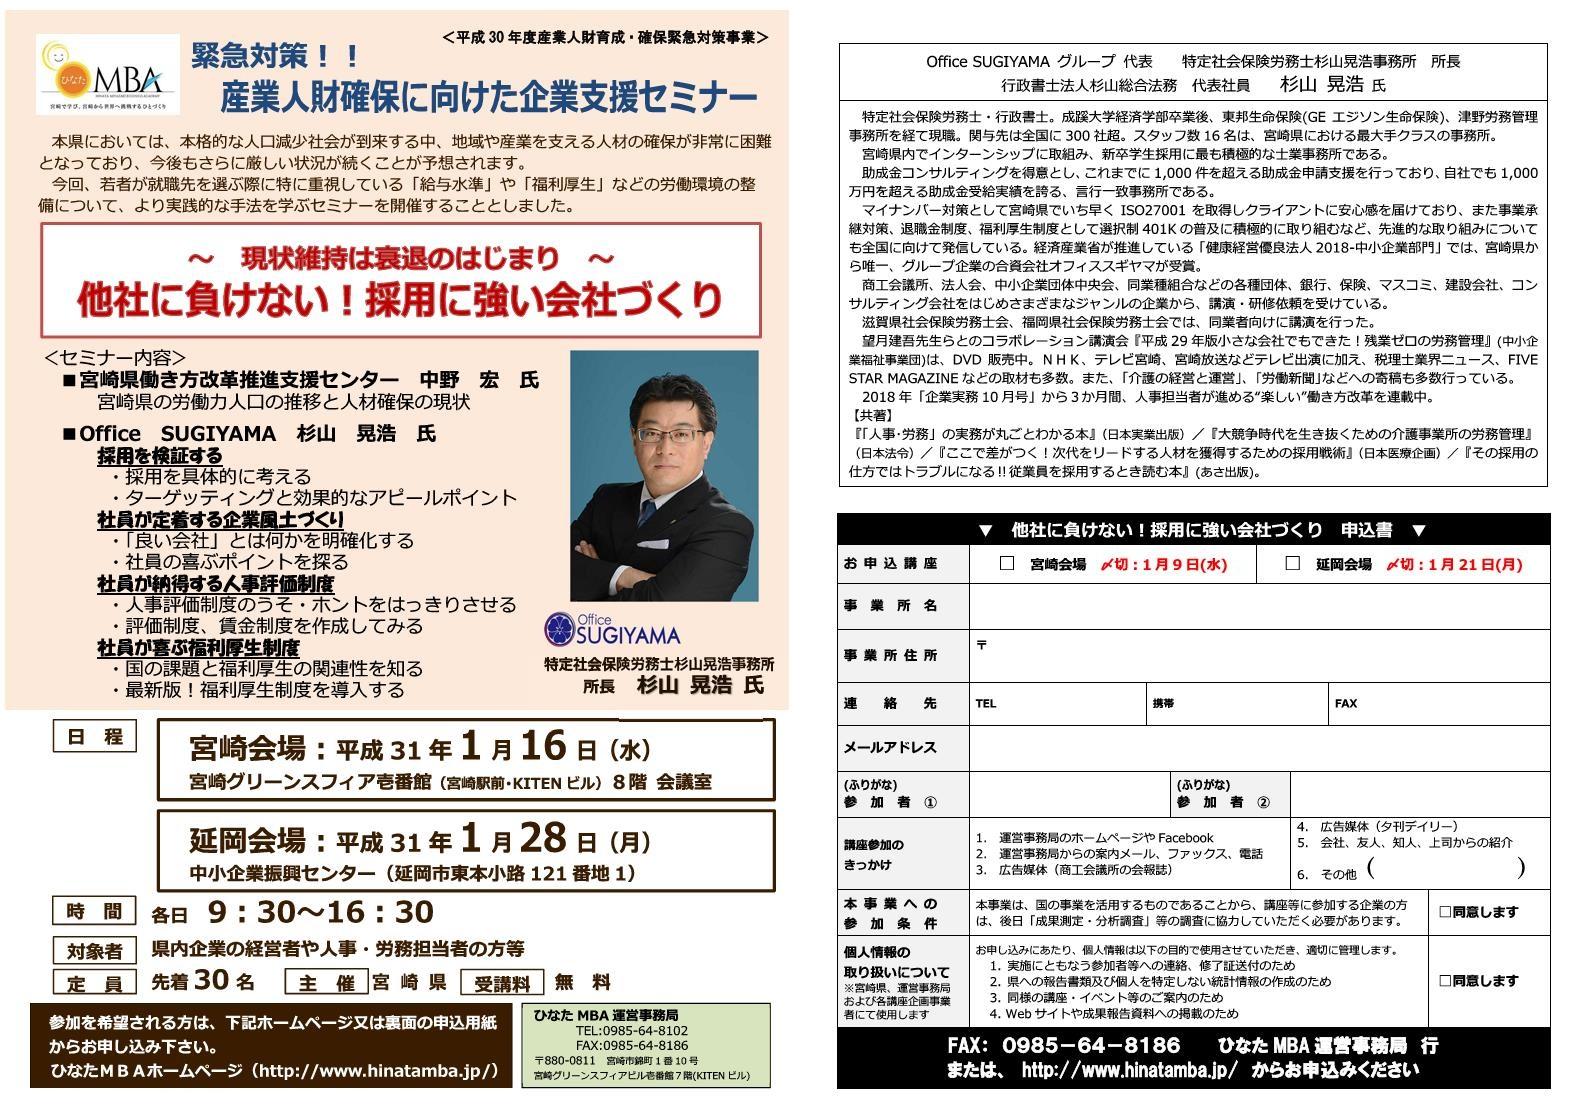 sangyoujinzaiseminar_3.jpg